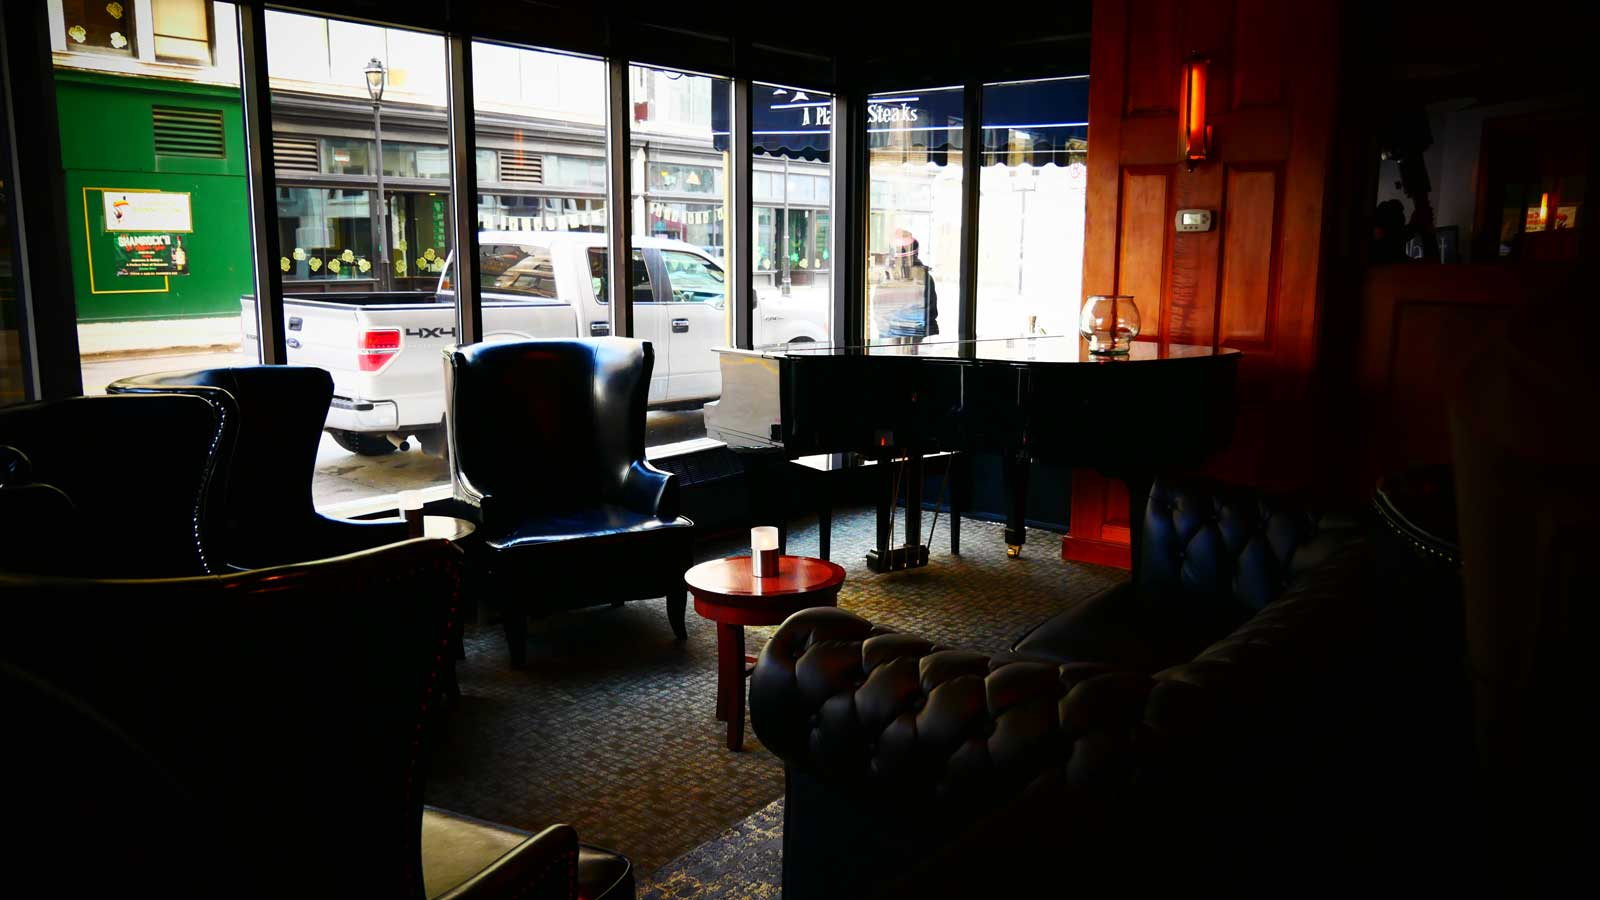 inside-best-steakhouse-downtown-mke.jpg